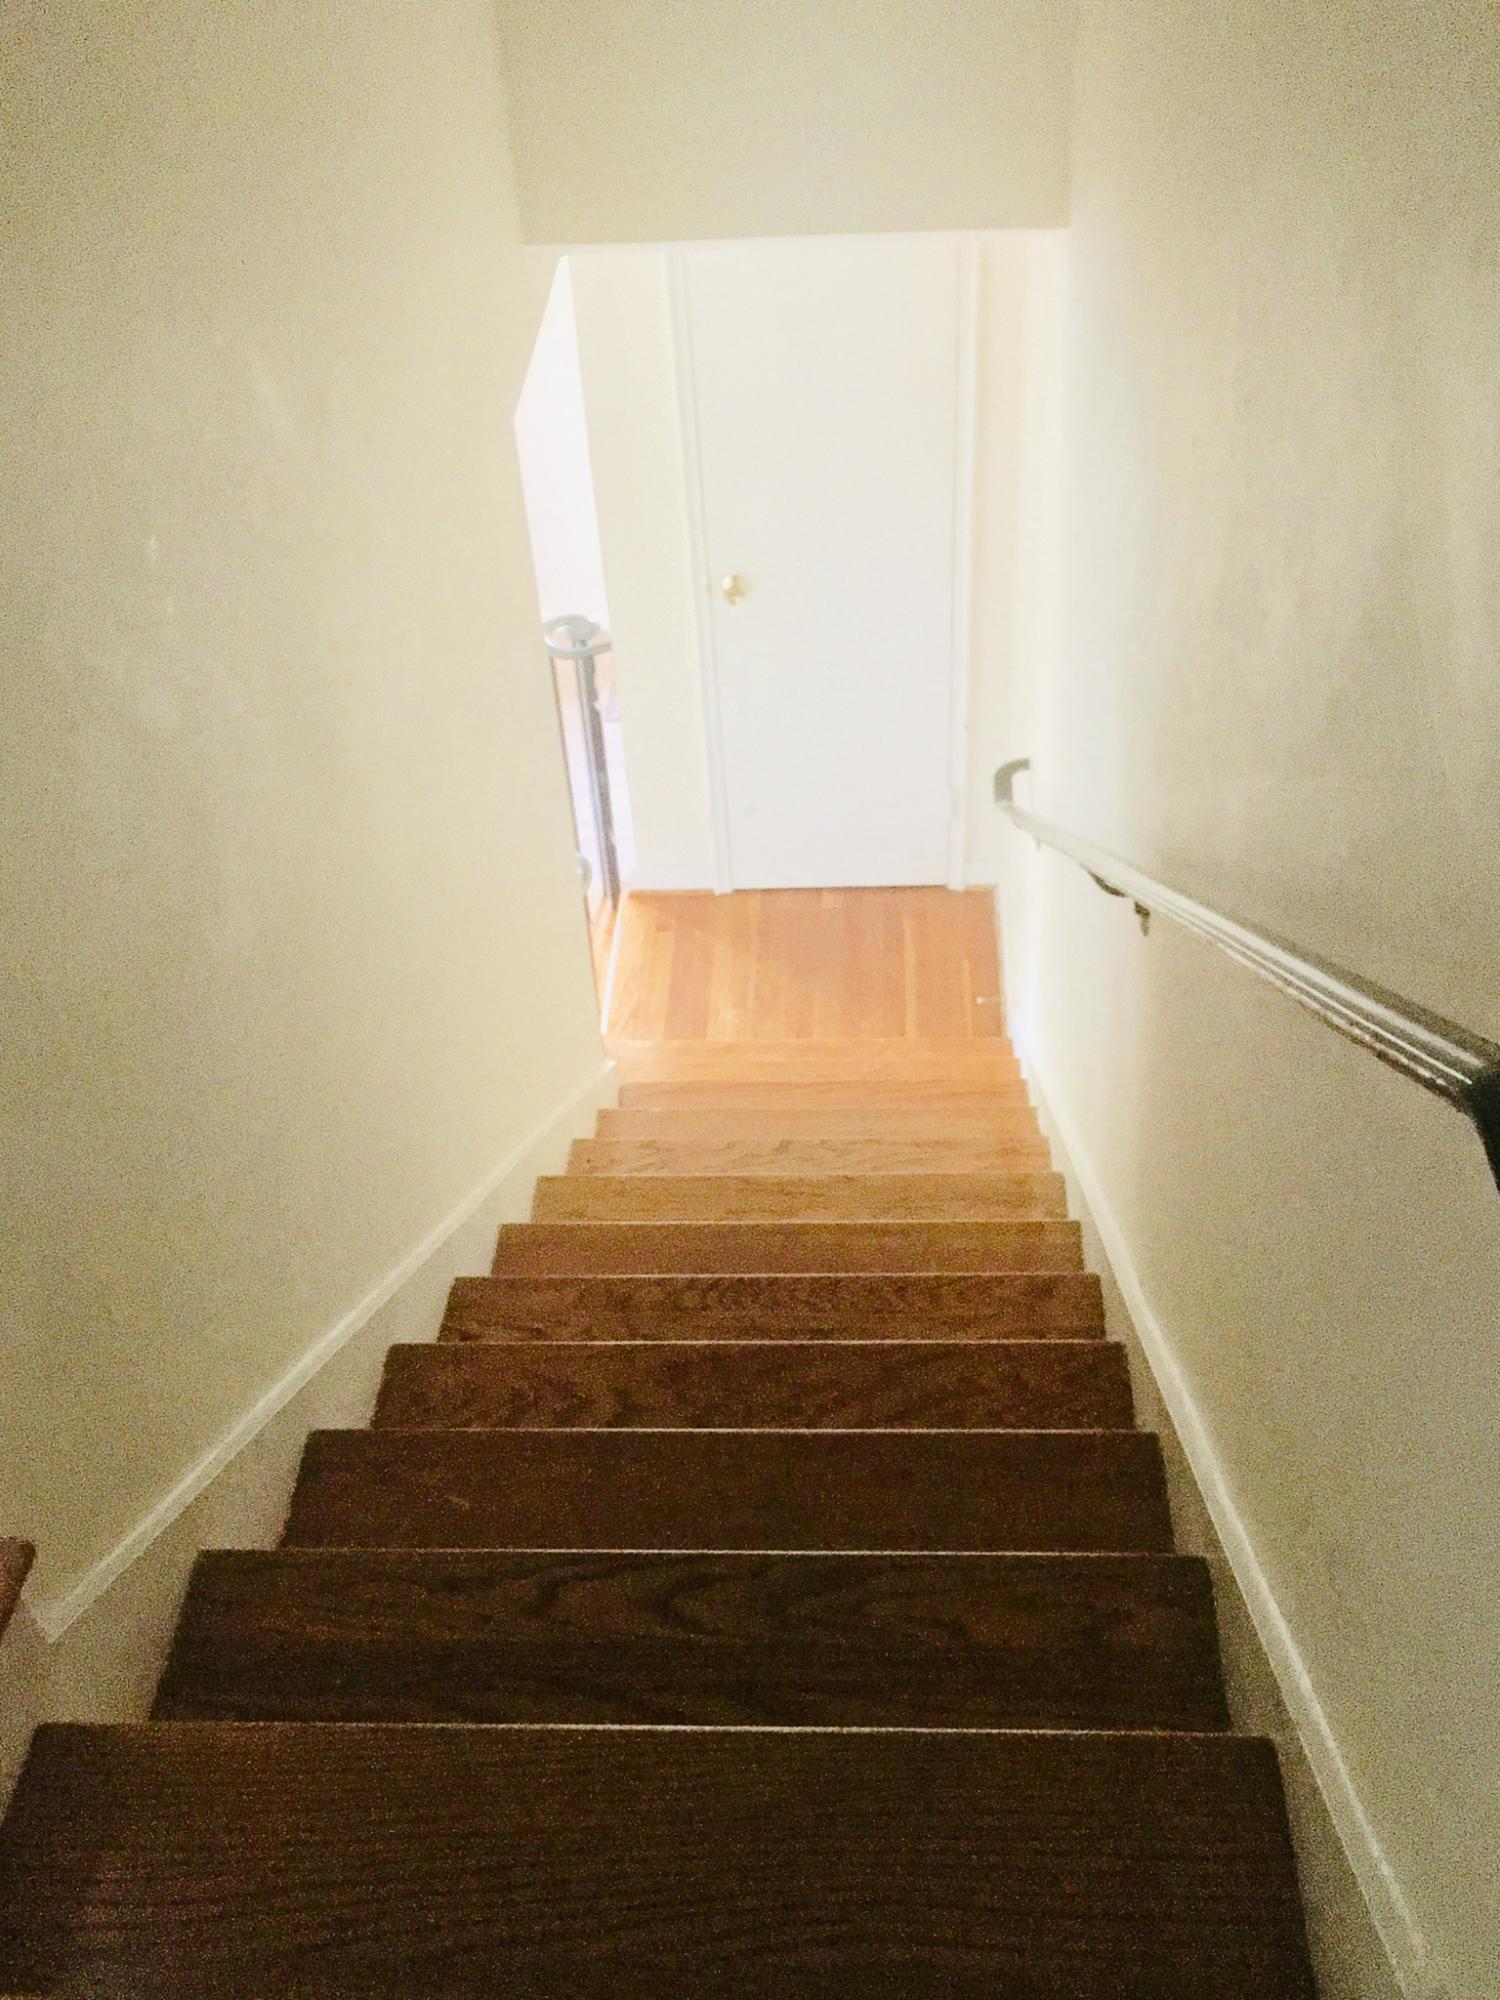 Rutledge Green Homes For Sale - 173 Rutledge Ave, Charleston, SC - 11